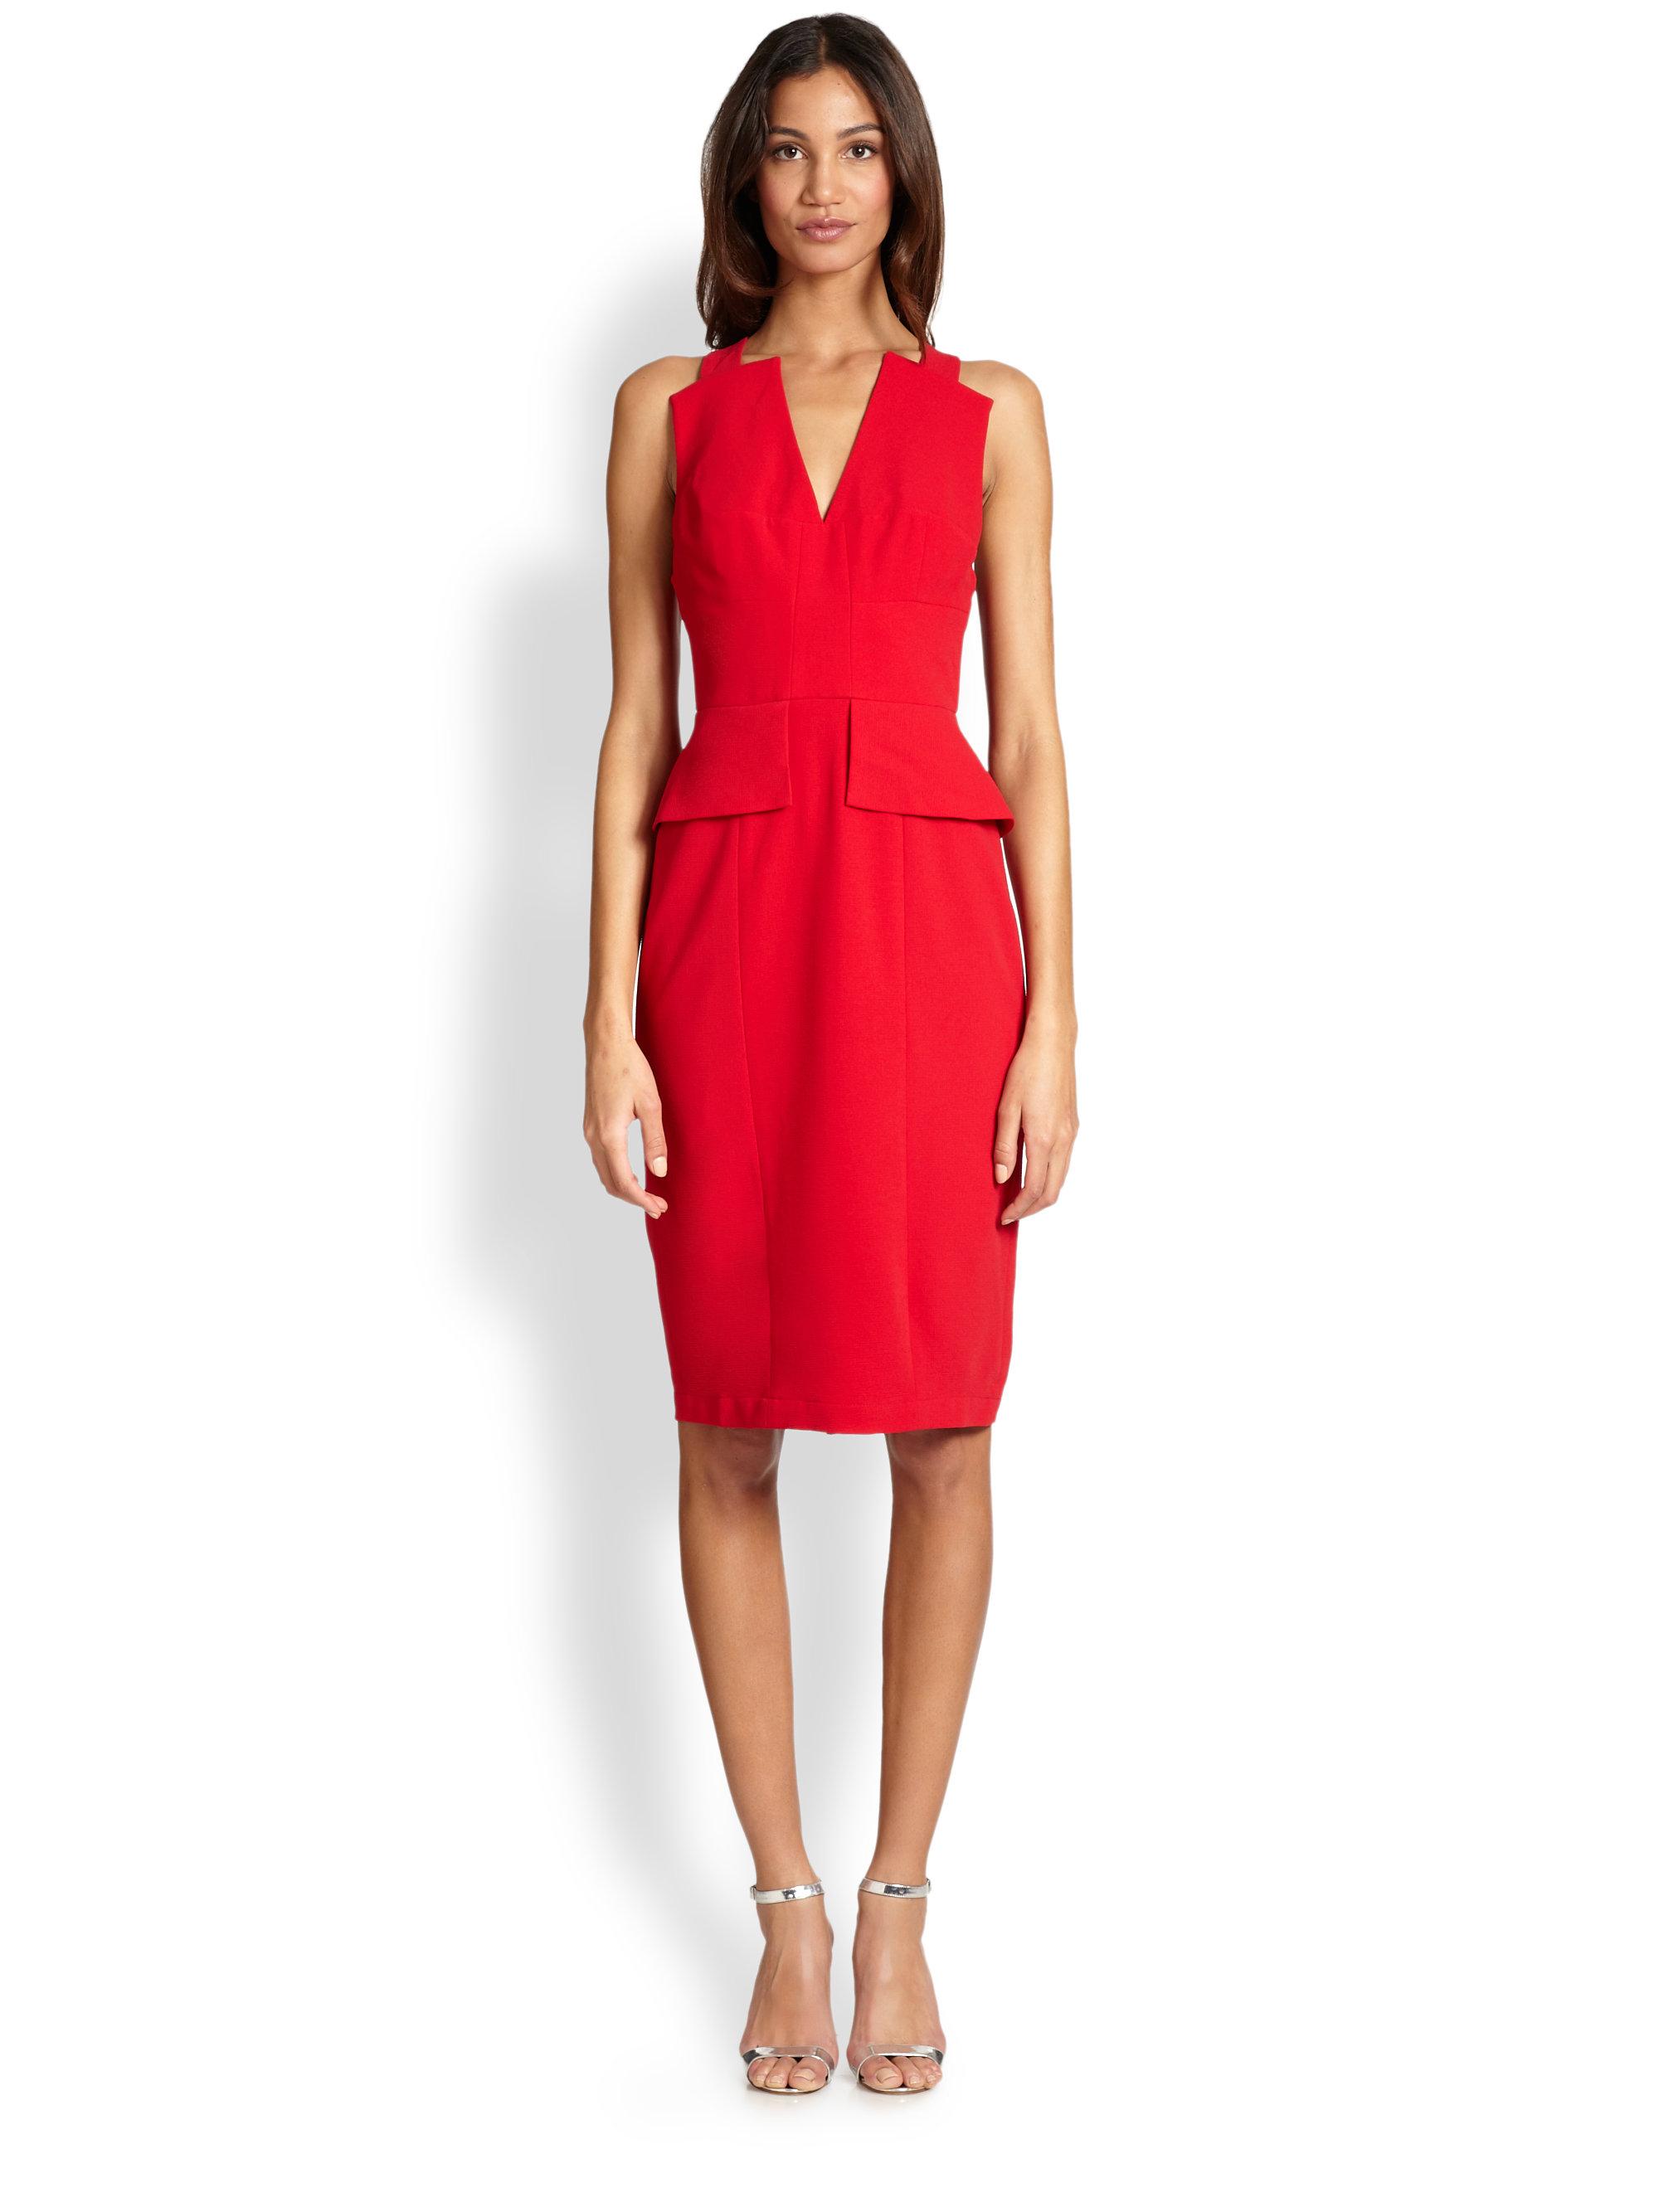 Lyst - Bcbgmaxazria Alena Peplum Dress in Red